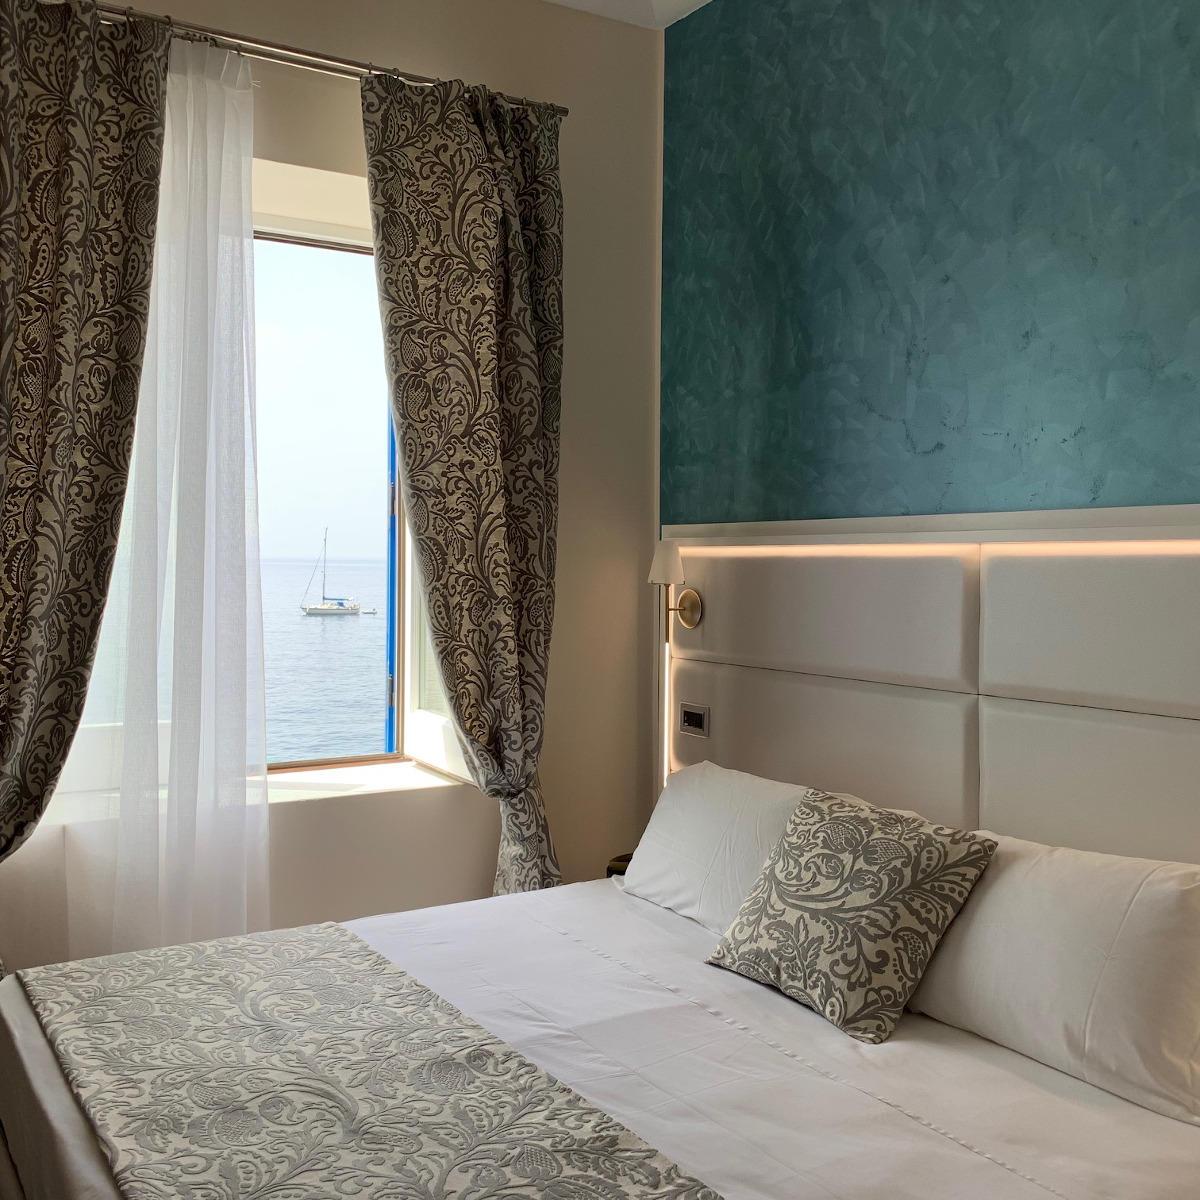 Ariana_Hotel_Isole_Eolie_UNA_Esperienze_SuperiorRoom_Family